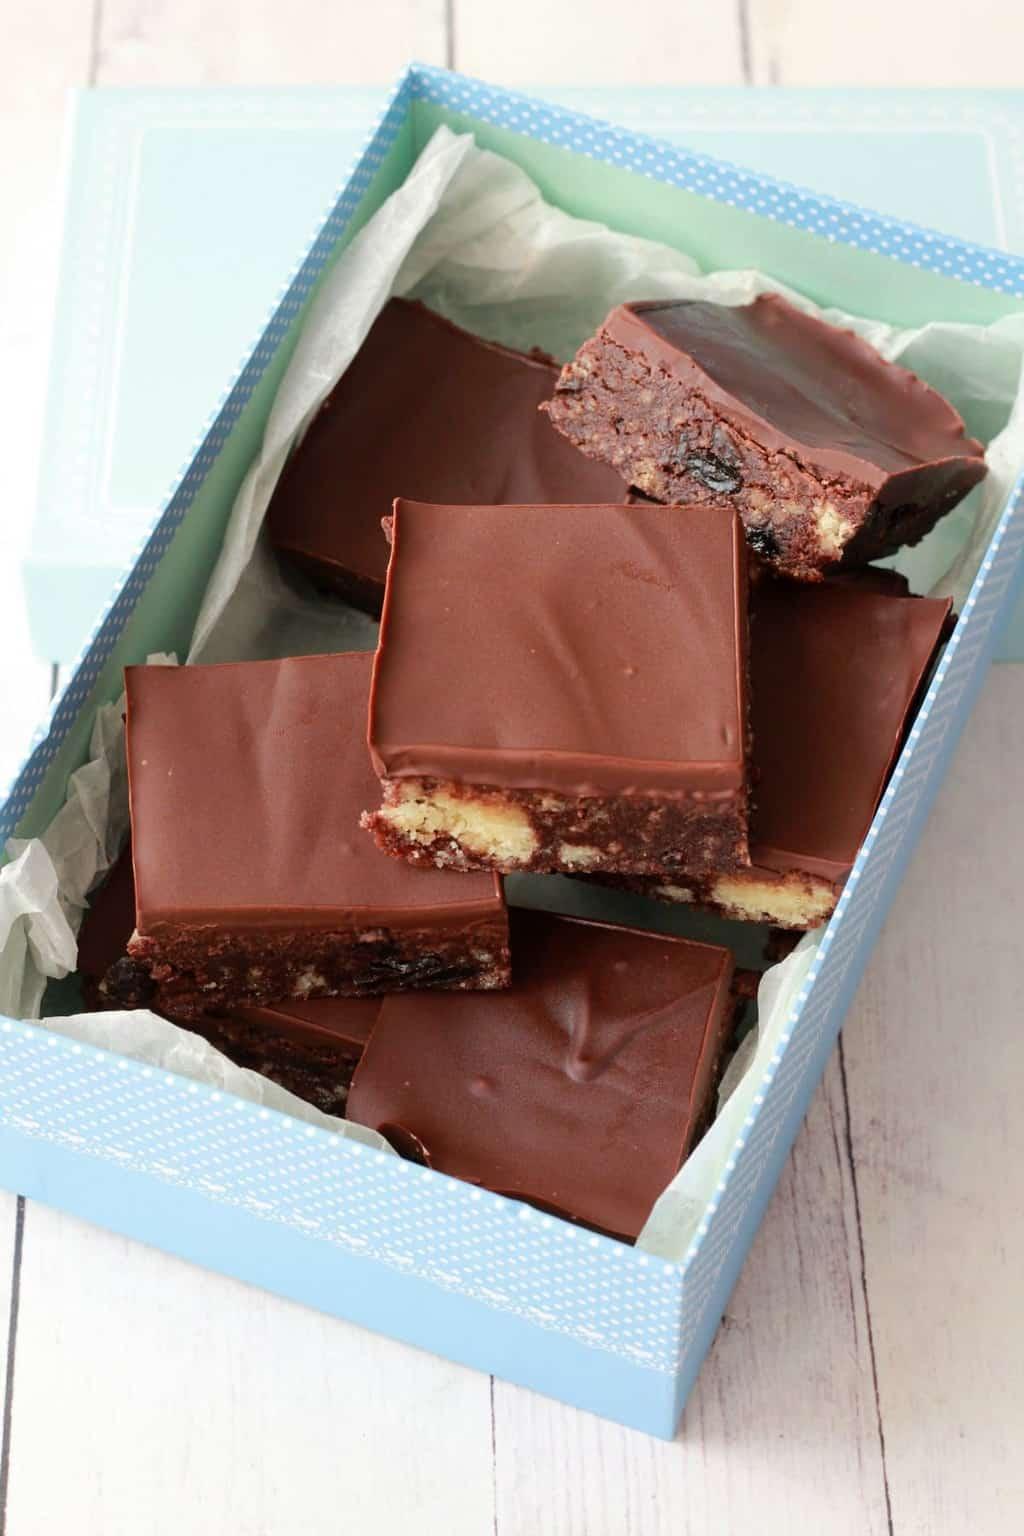 Chocolate Tiffin Squares - crushed shortbread cookies and raisins surrounded in rich chocolate #vegan #lovingitvegan #chocolate #tiffin #dessert #dairyfree